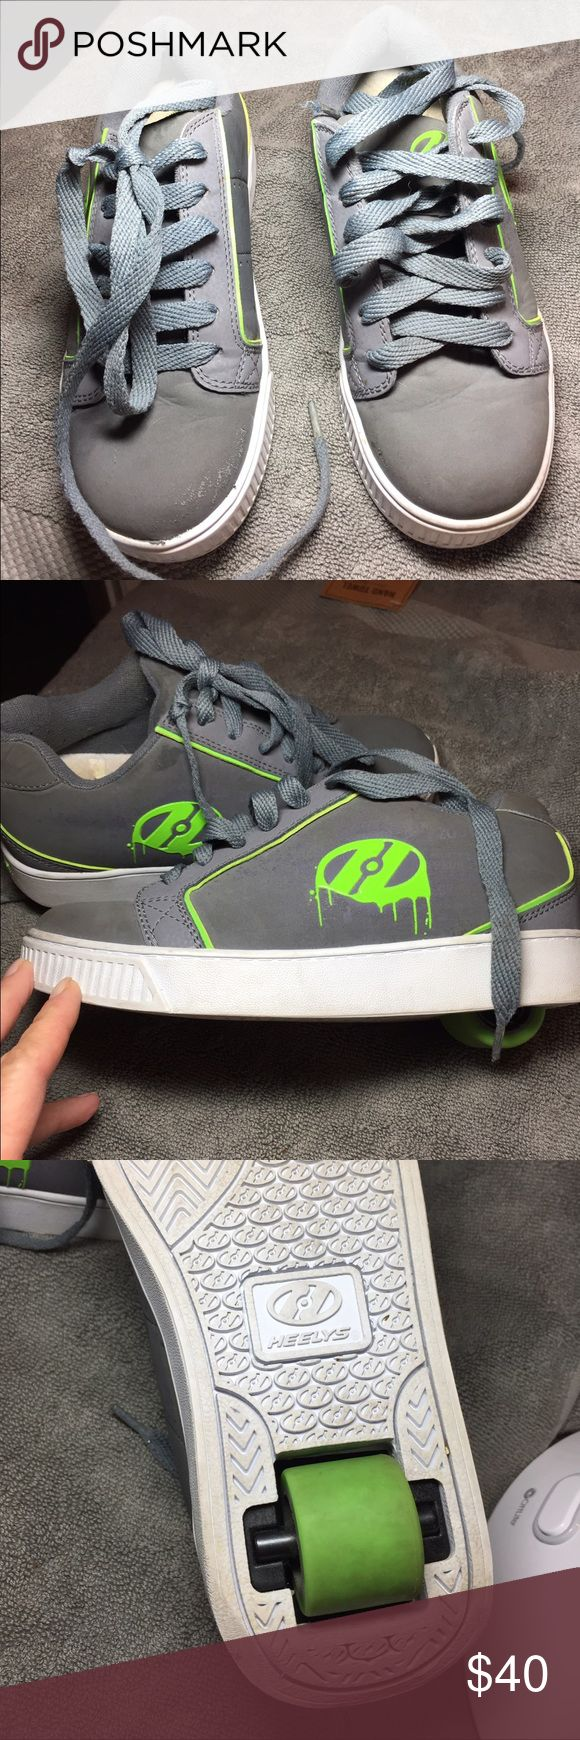 Sidewalk sport lane roller skate shoes - Boys Heelys Skate Shoes Single Wheels